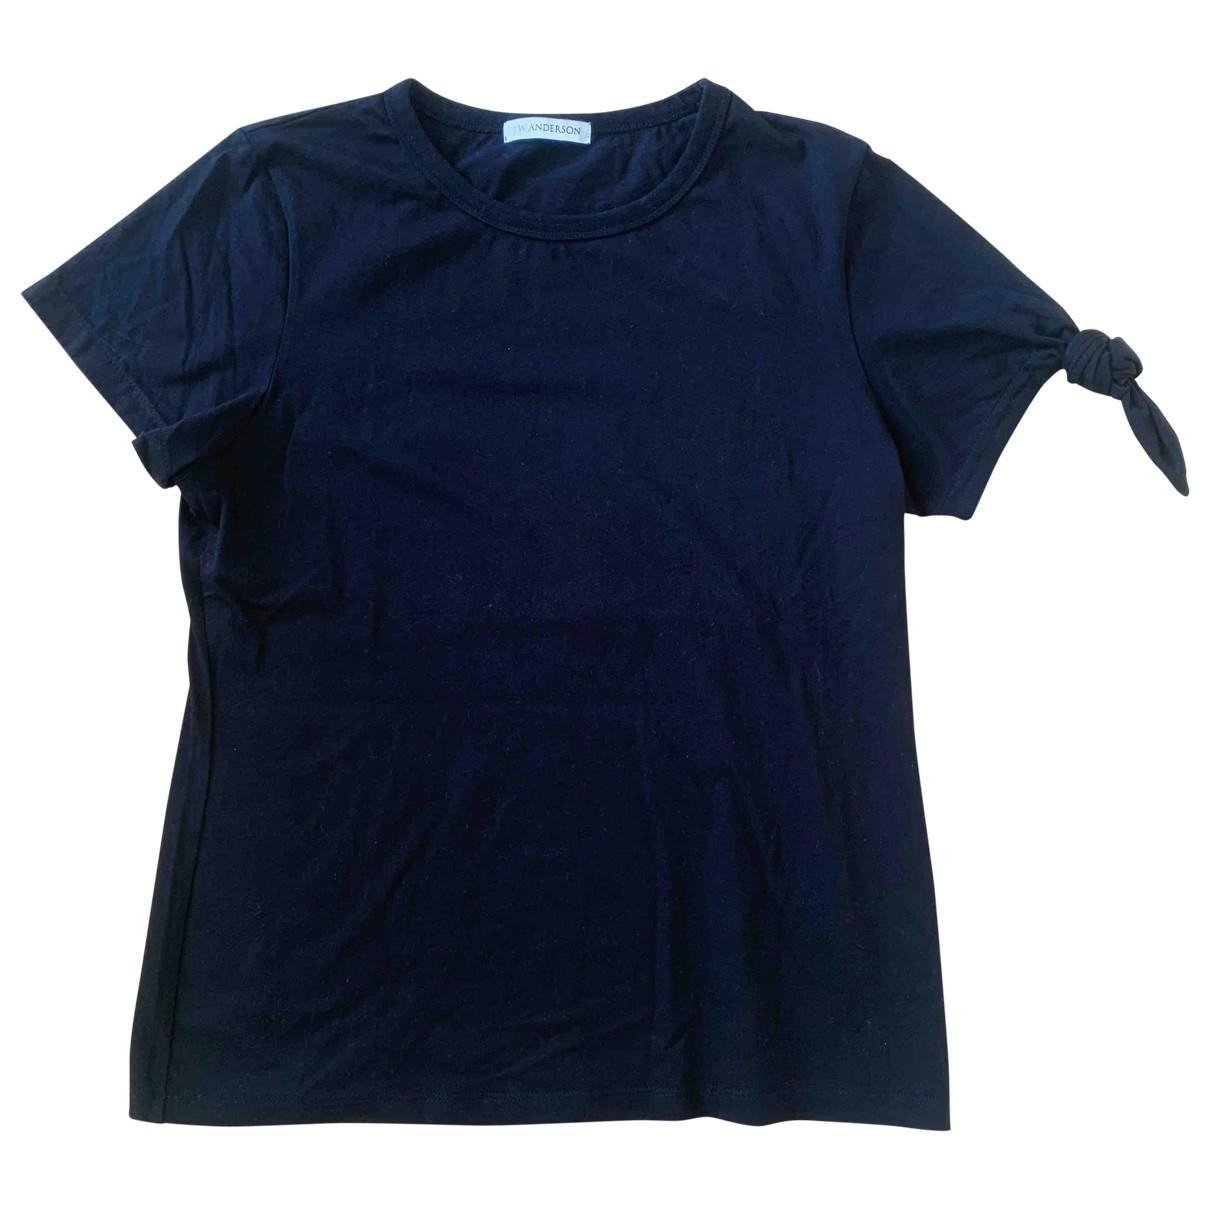 J.w. Anderson \N Black Cotton  top for Women 36 FR